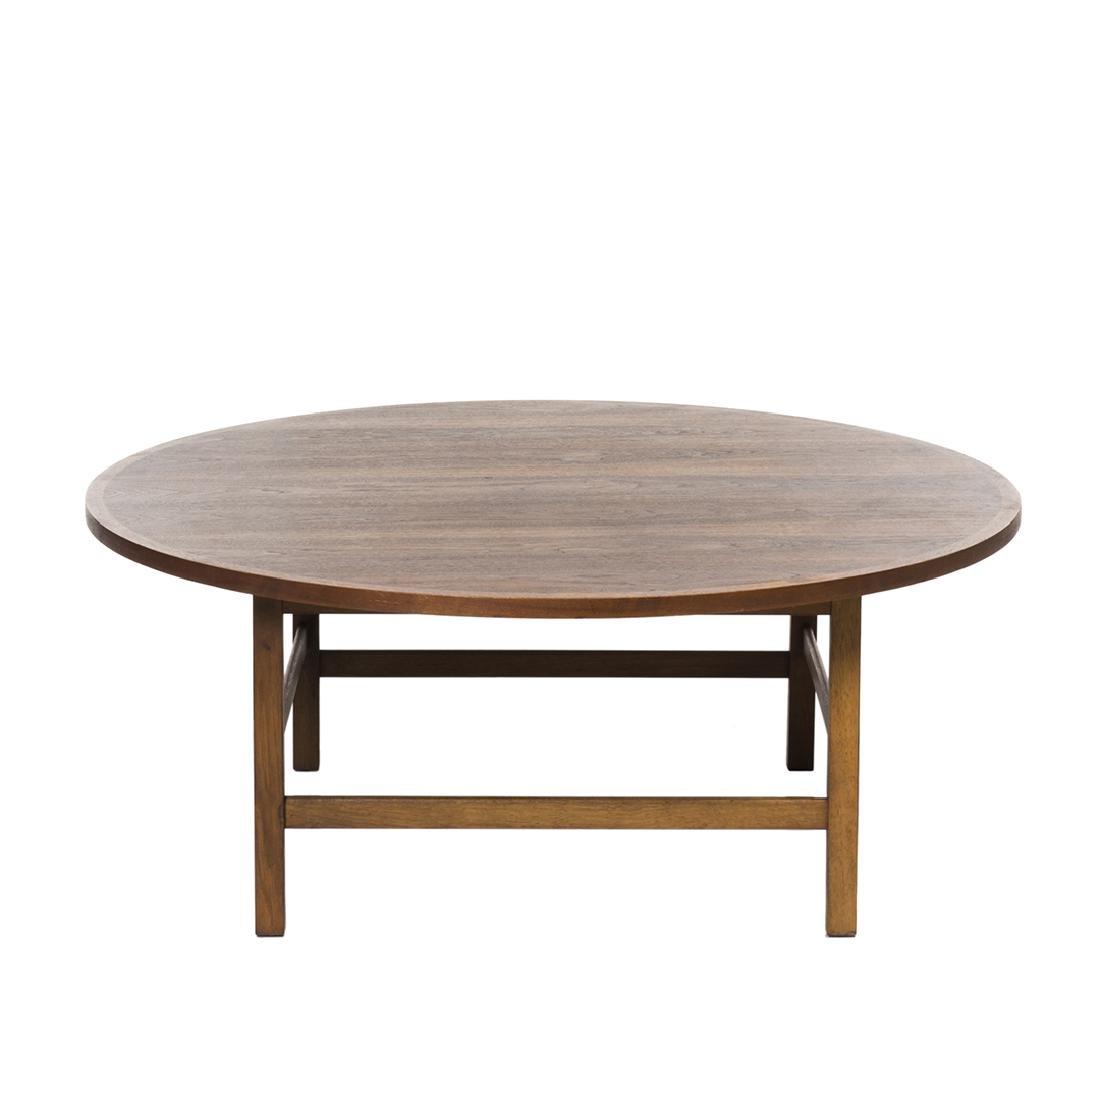 Paul McCobb Coffee Table